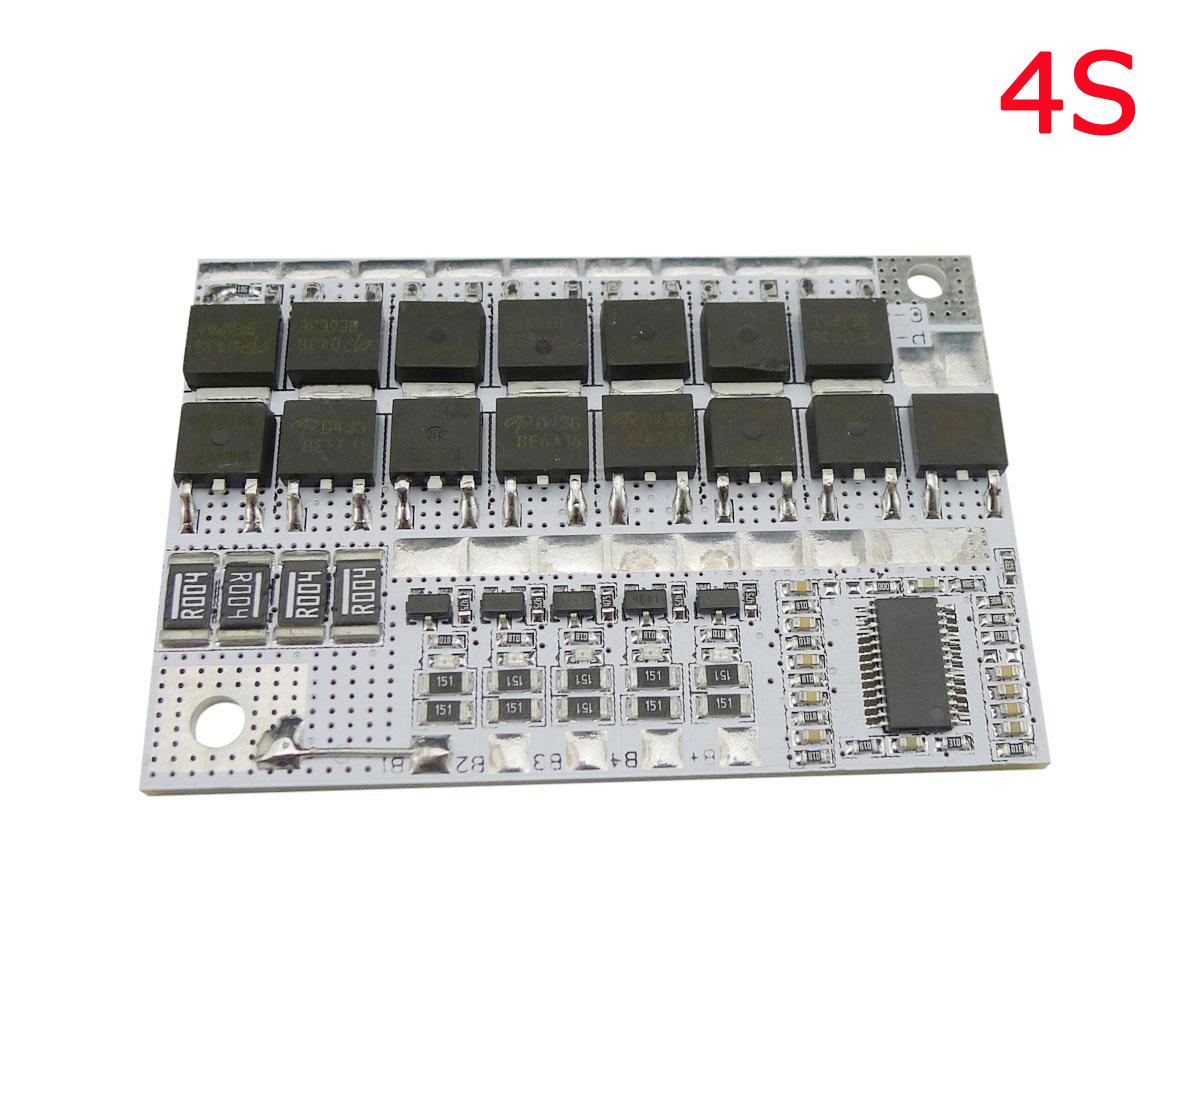 Aihasd 16,8 V 100A 4S BMS Li-Ion LMO Ternary литиевая батарея, защитная печатная плата